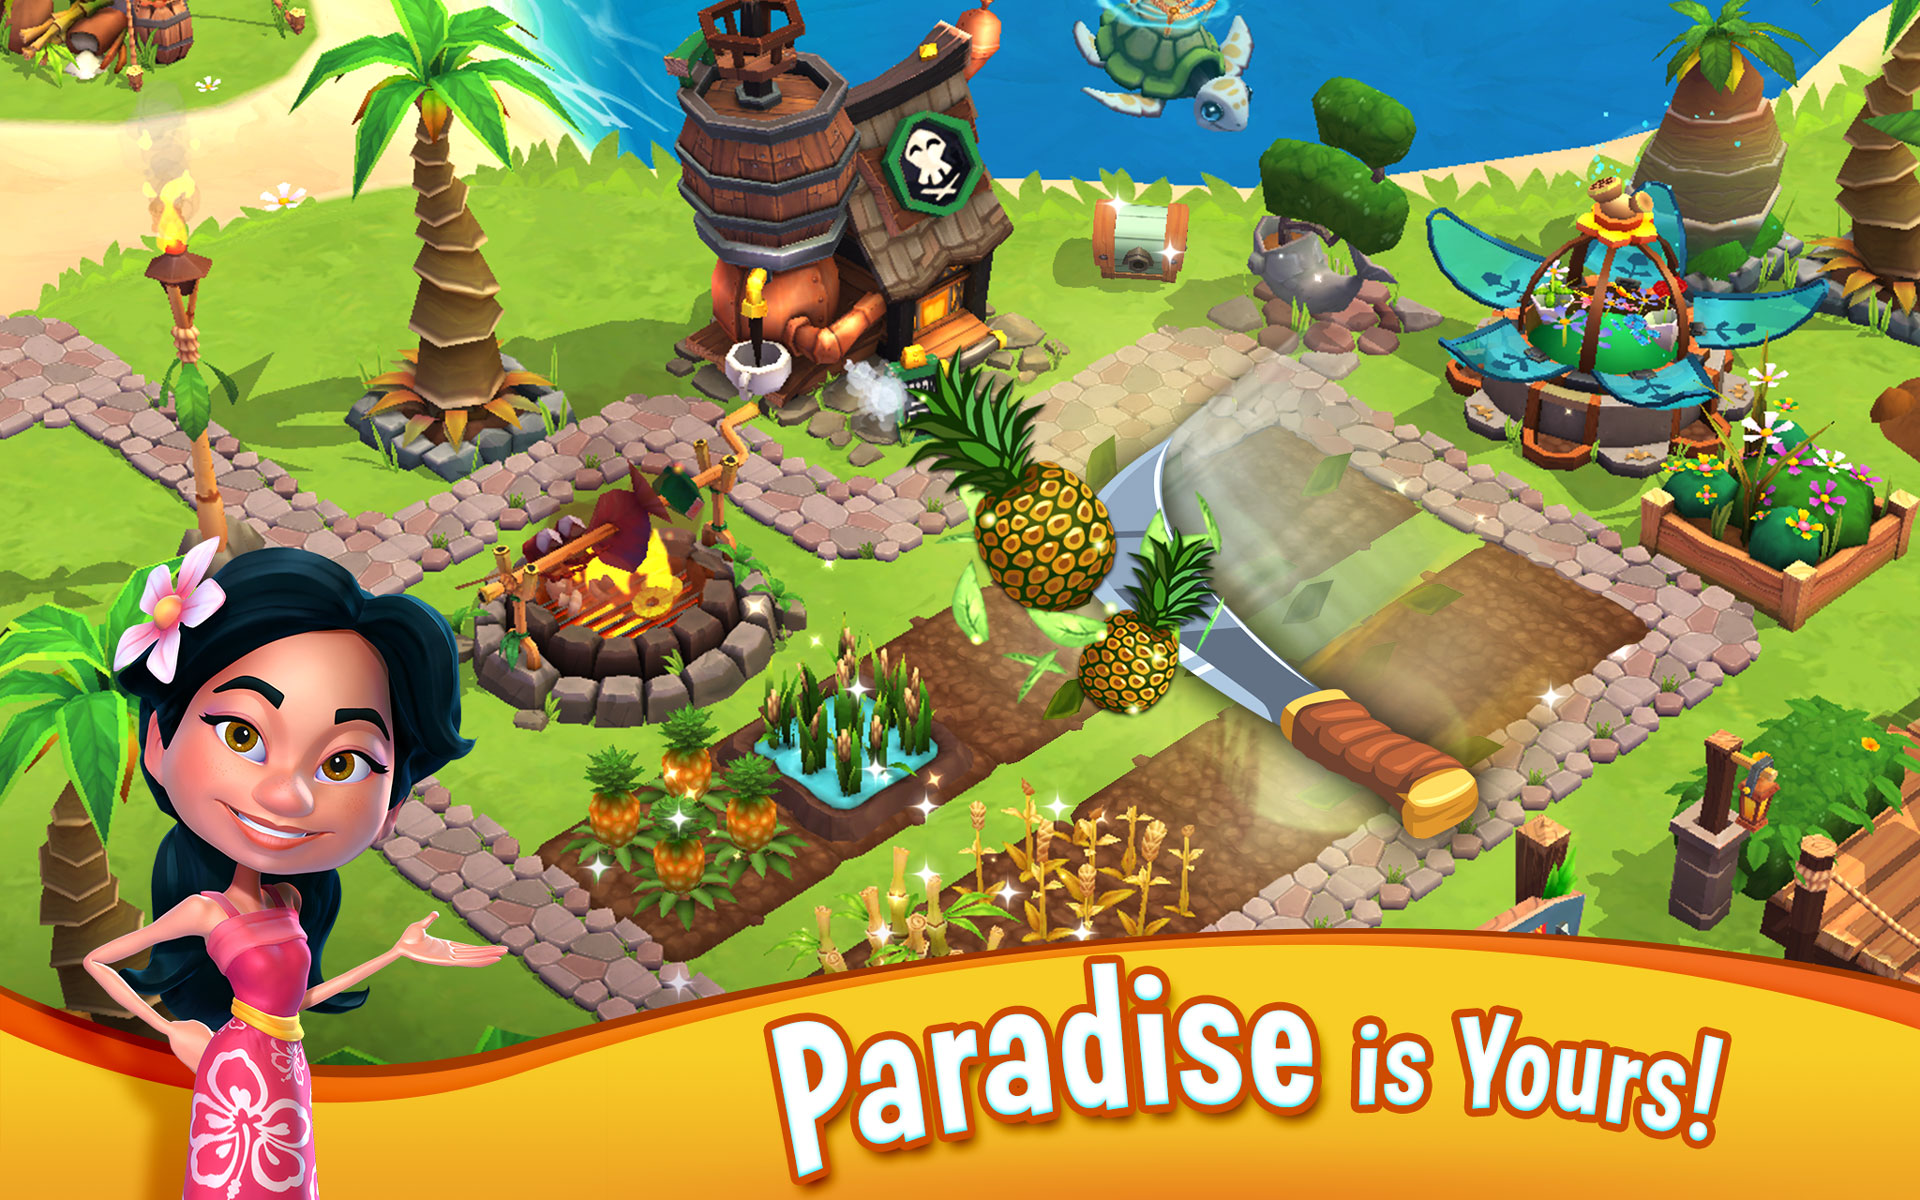 Amazoncom apps games - Amazoncom Apps Games 35